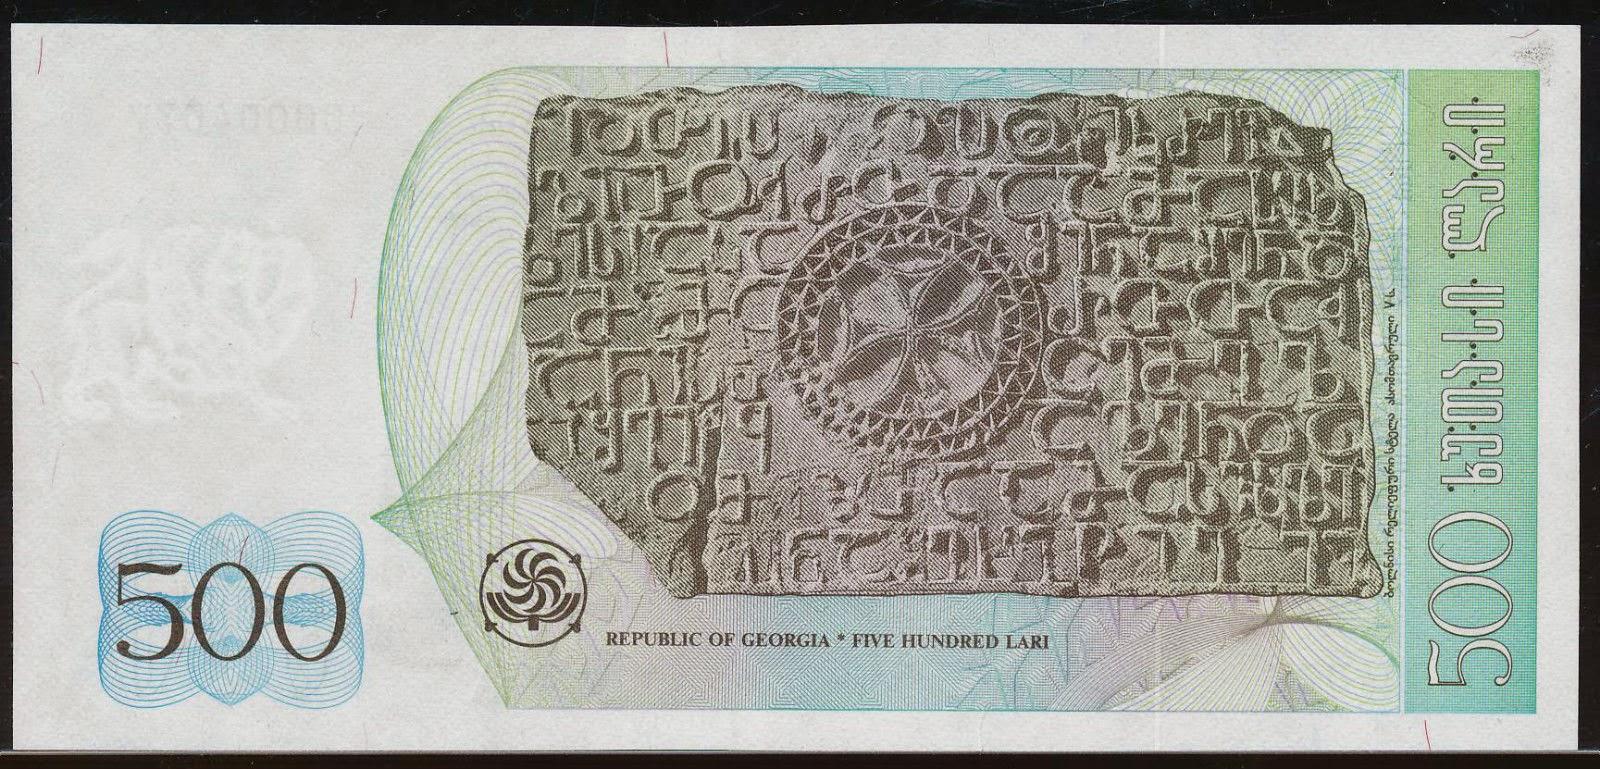 Georgia banknotes 500 Lari note